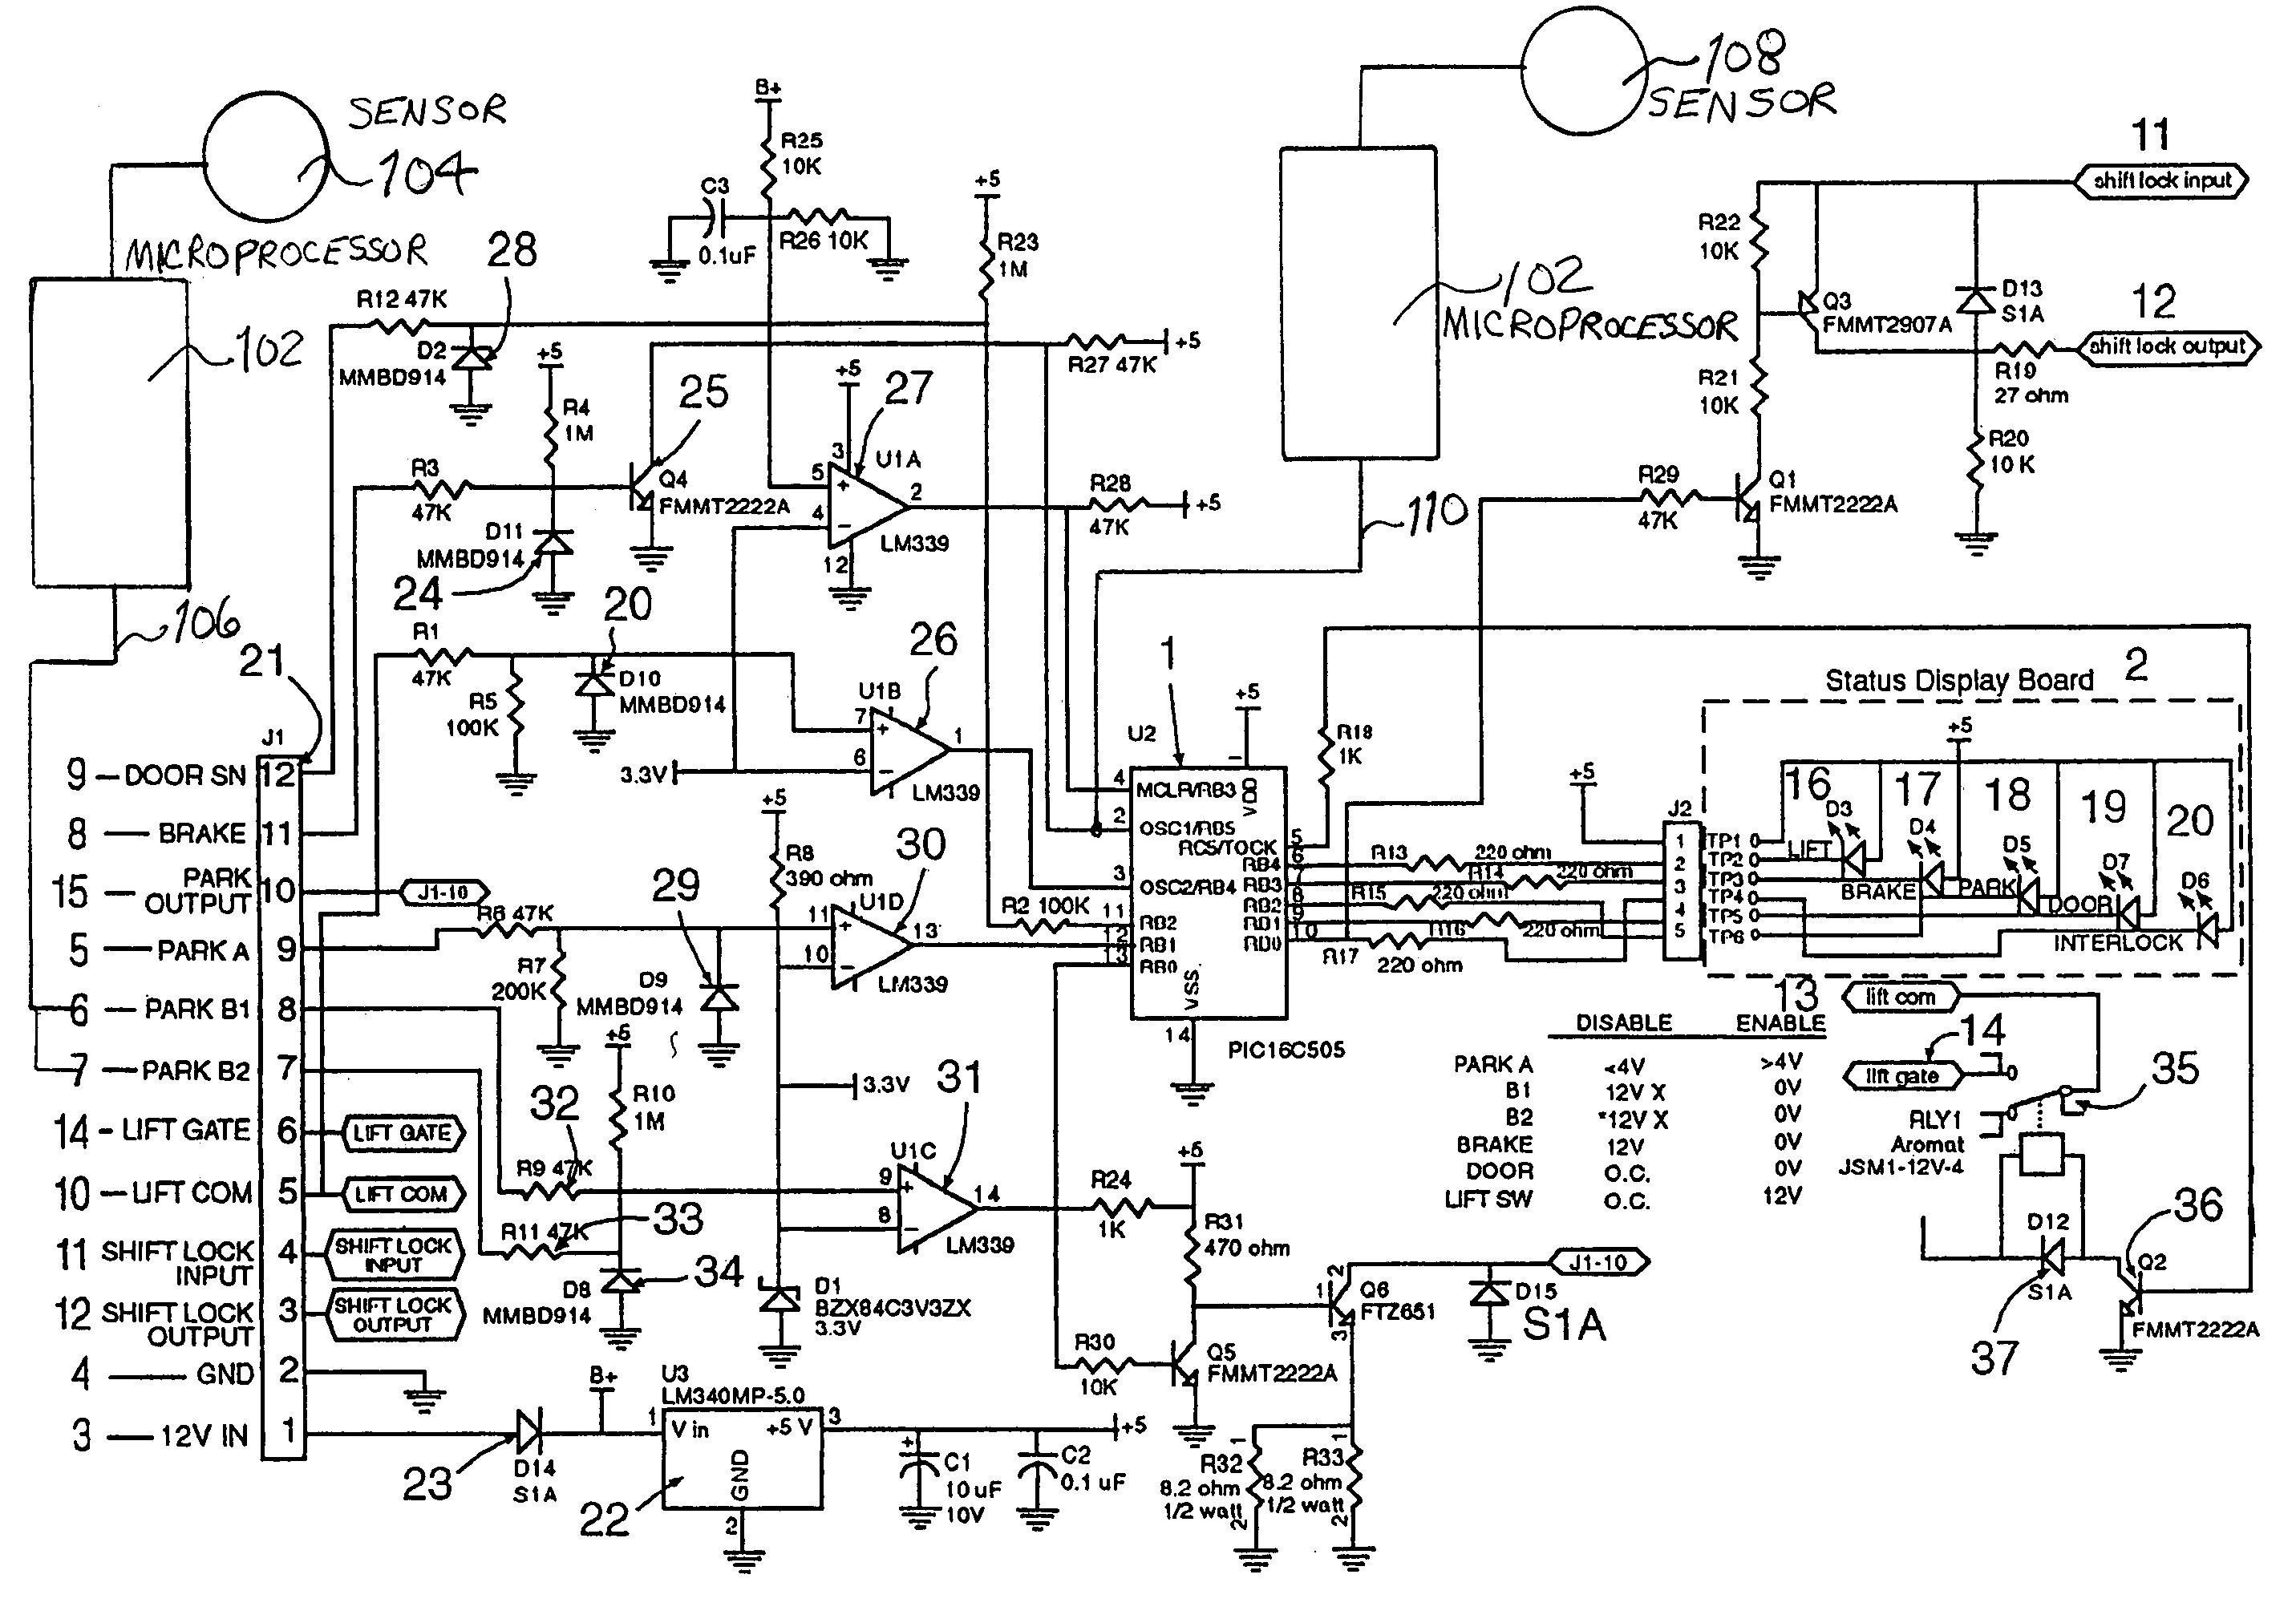 rheem rhllhm3617ja wiring diagram 1998 ford expedition radio braun wheelchair lift download sample ricon stannah stair 19 n